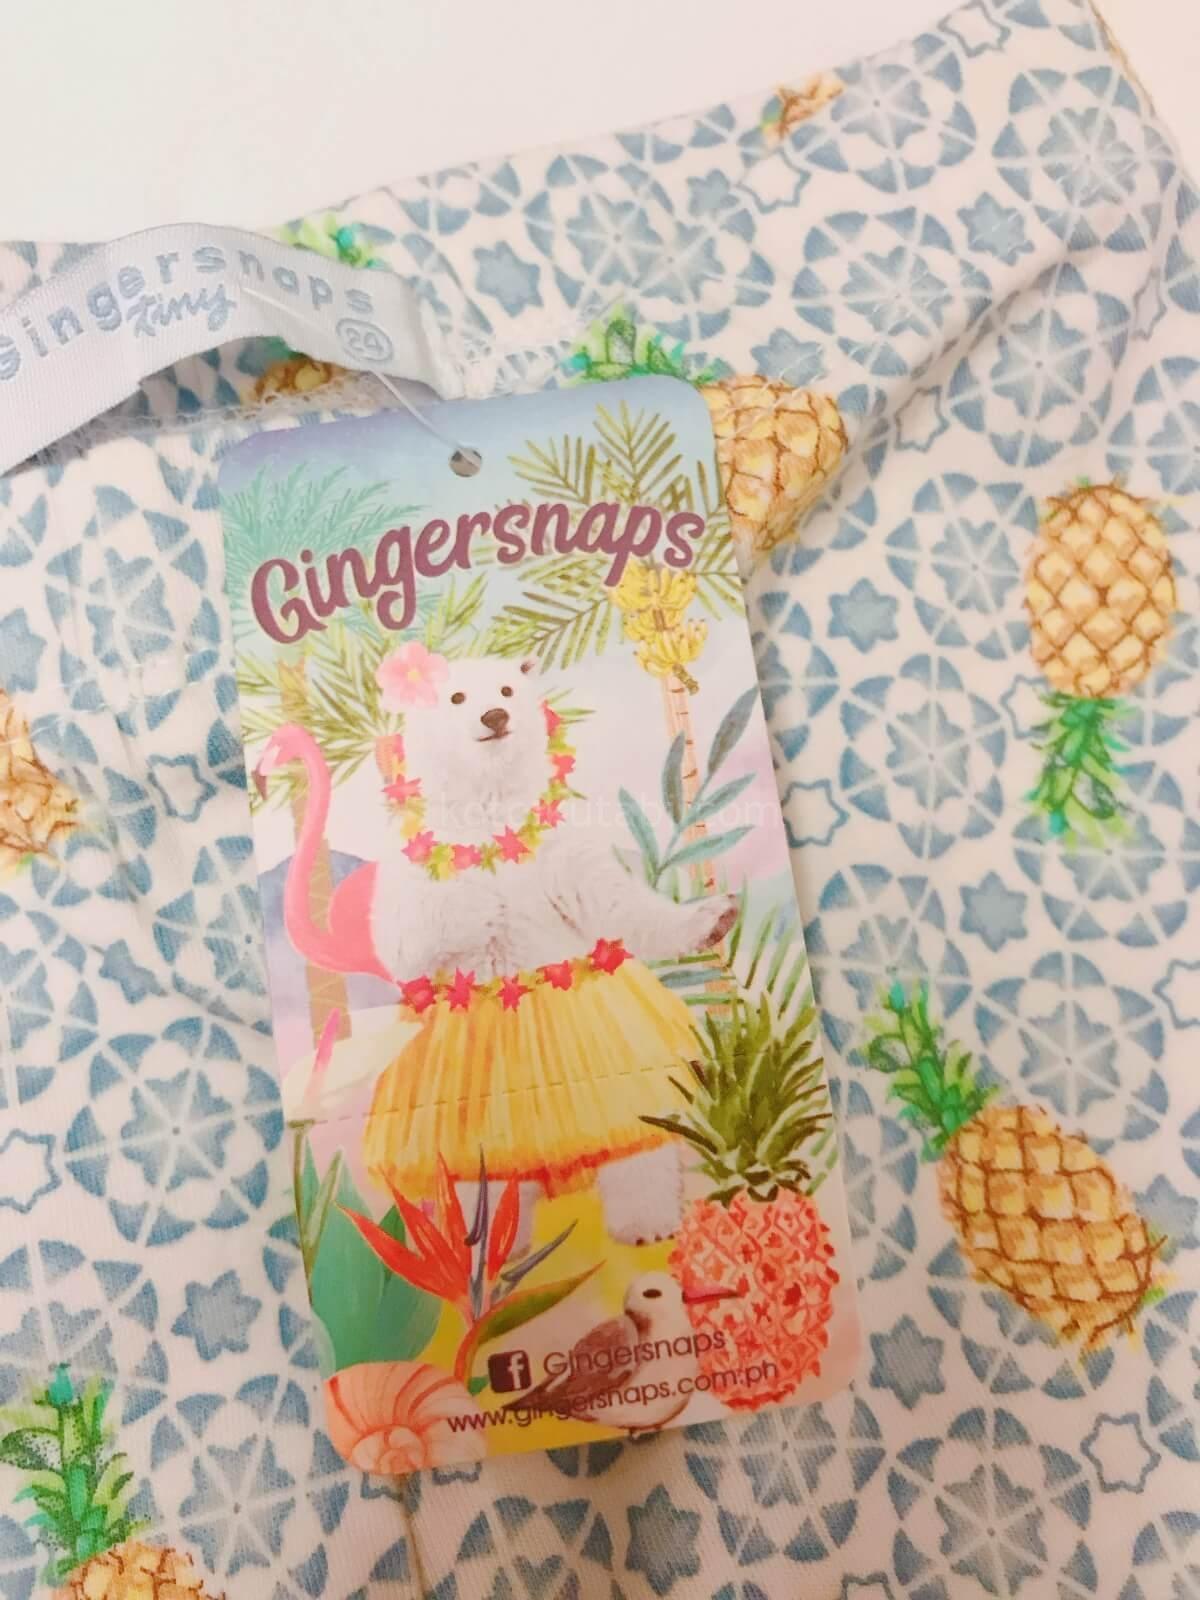 Gingersnapsの商品タグのイラストがかわいい!